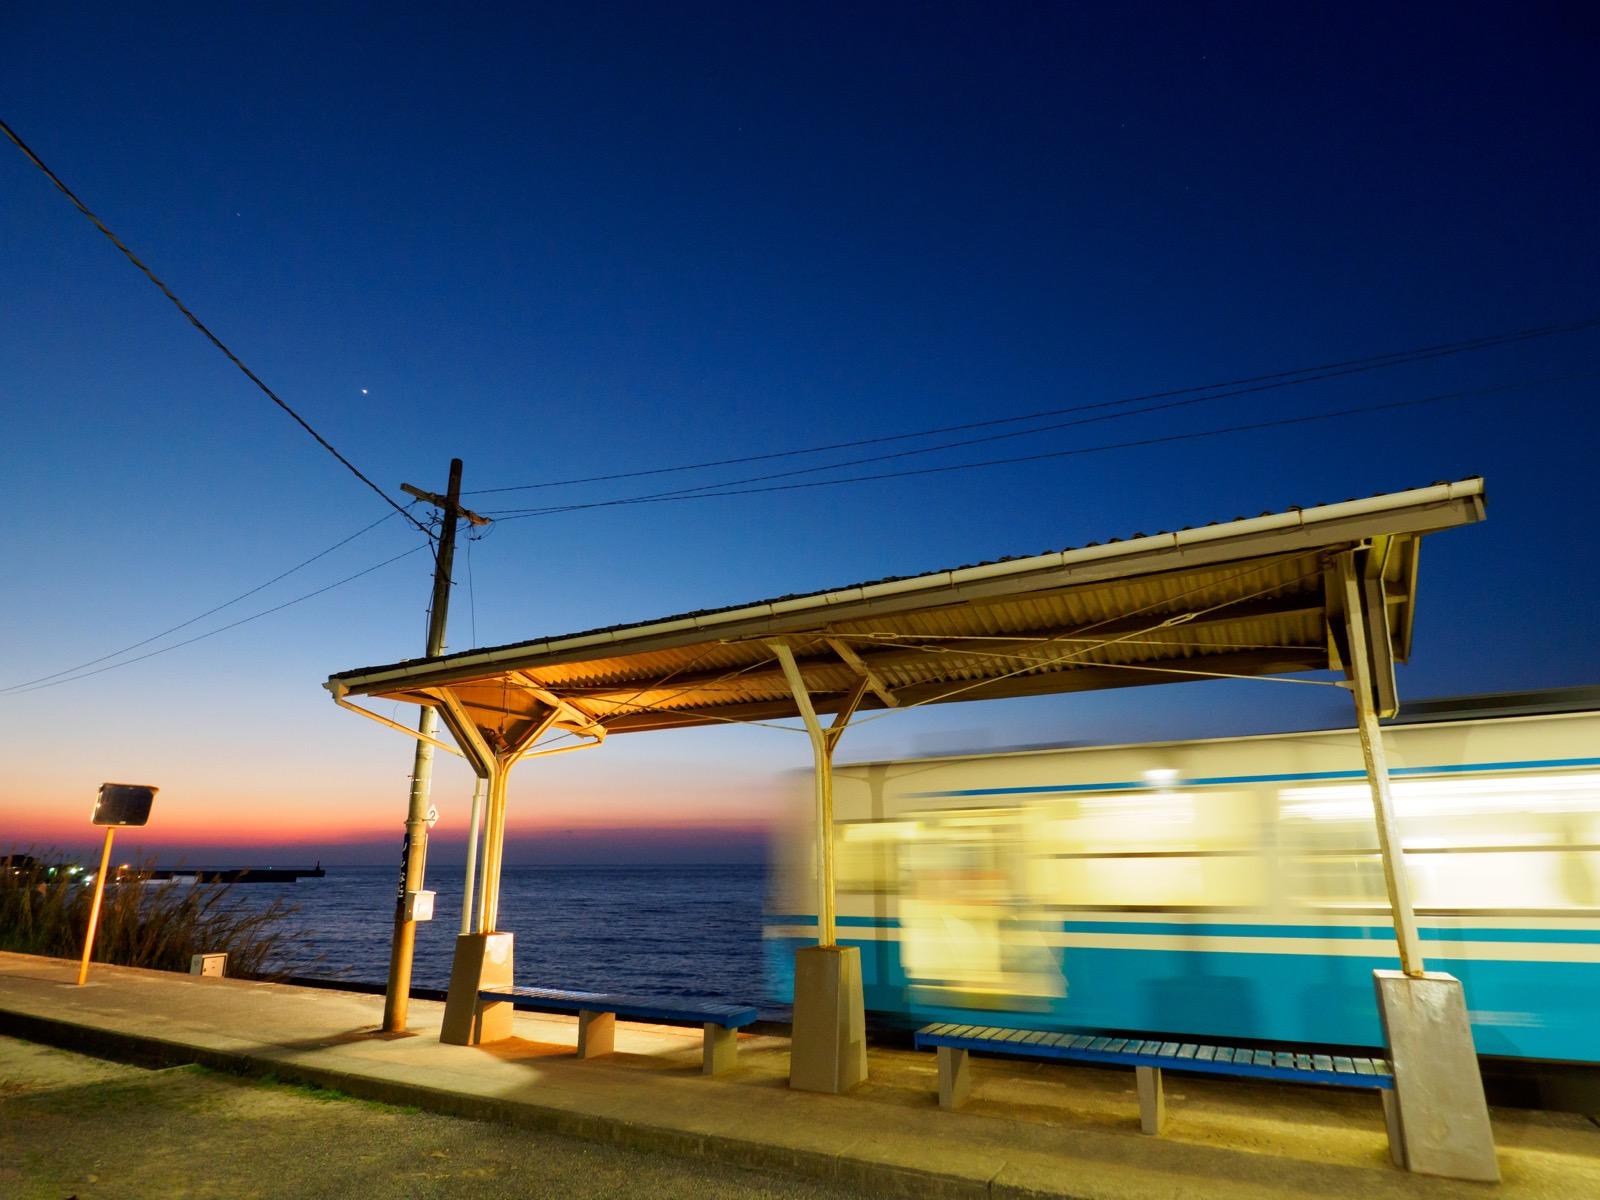 夜の下灘駅